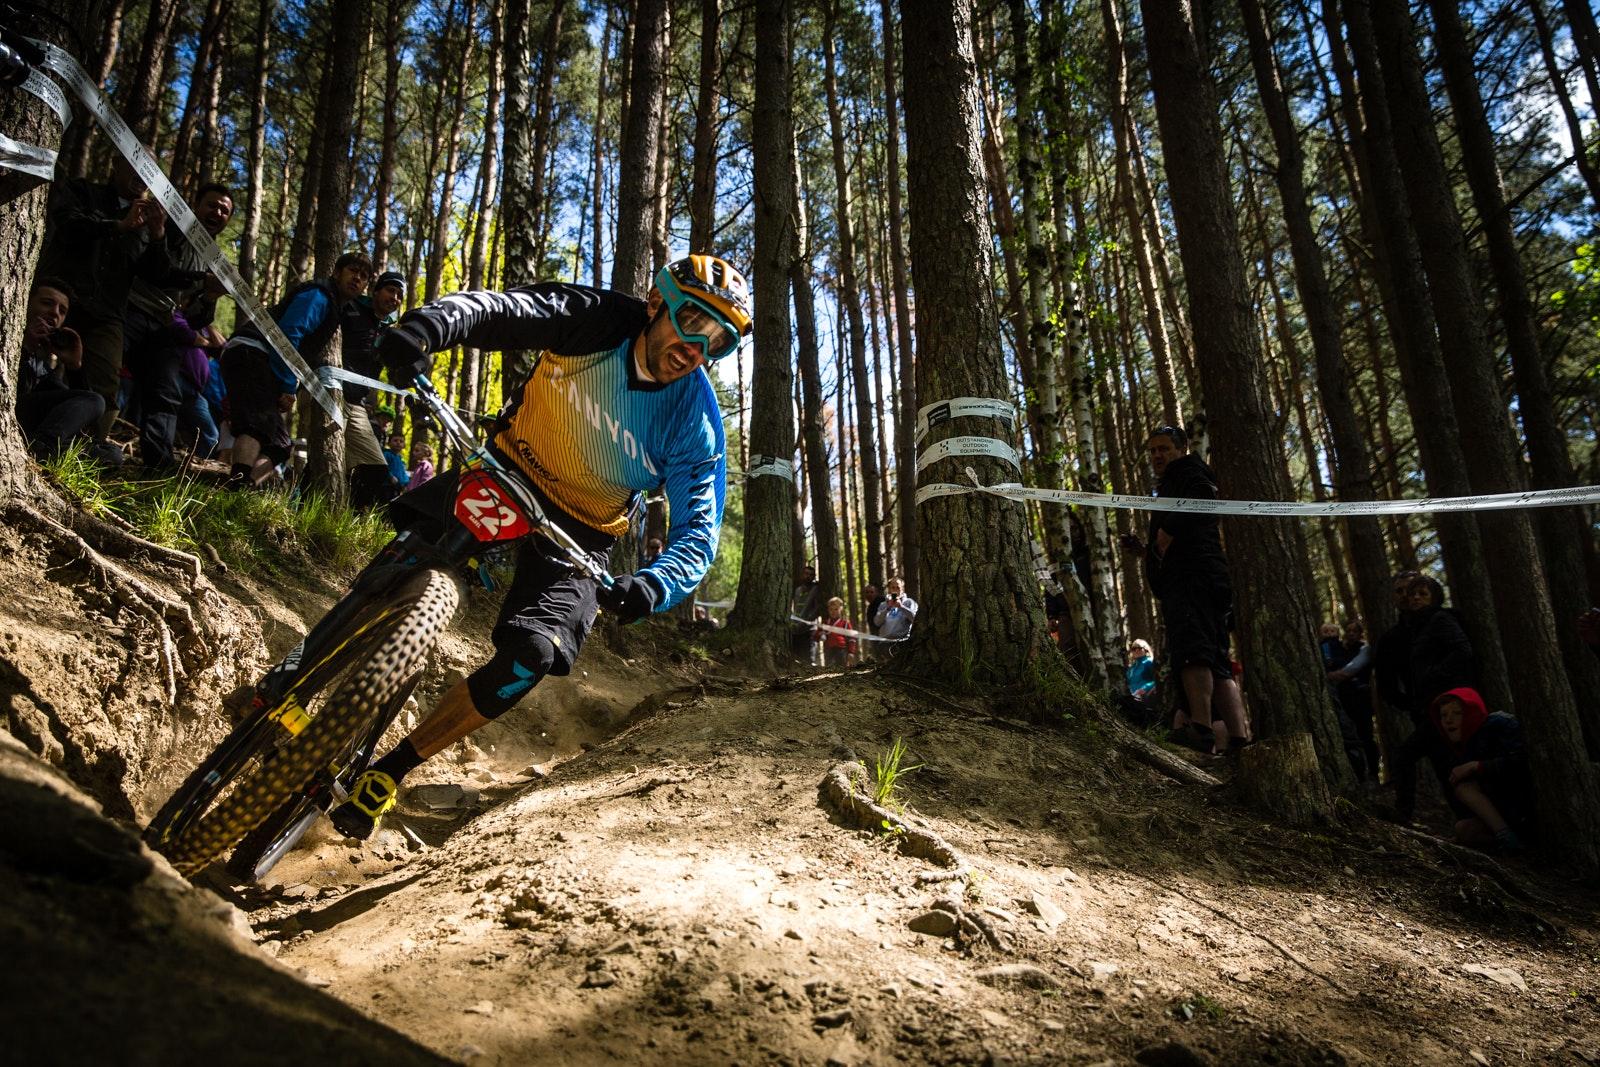 Fabien Barel - Greatest Downhill Mountain racers Ever